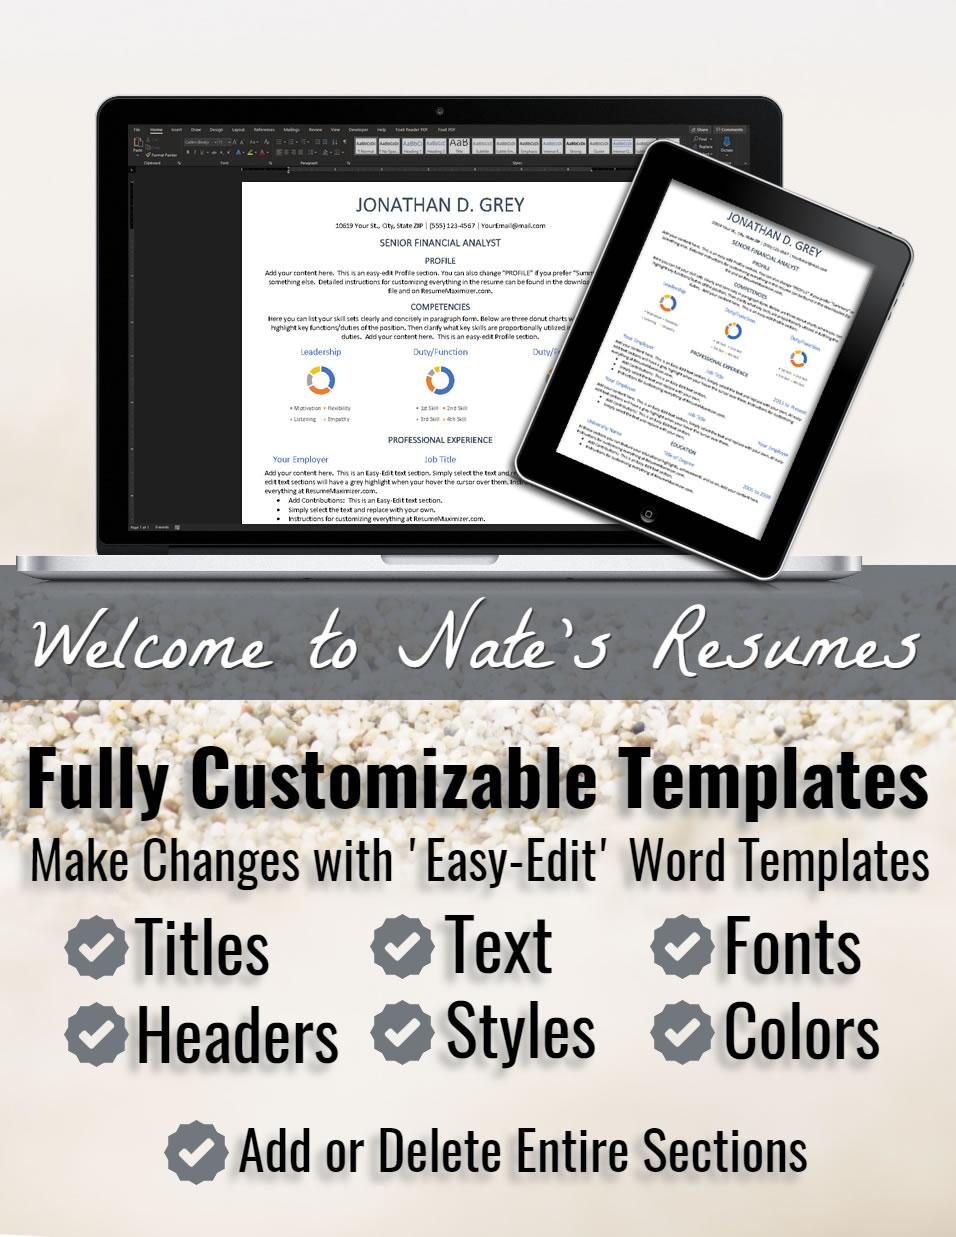 Display - Make-Easy-Edits-to-Templates-LONG